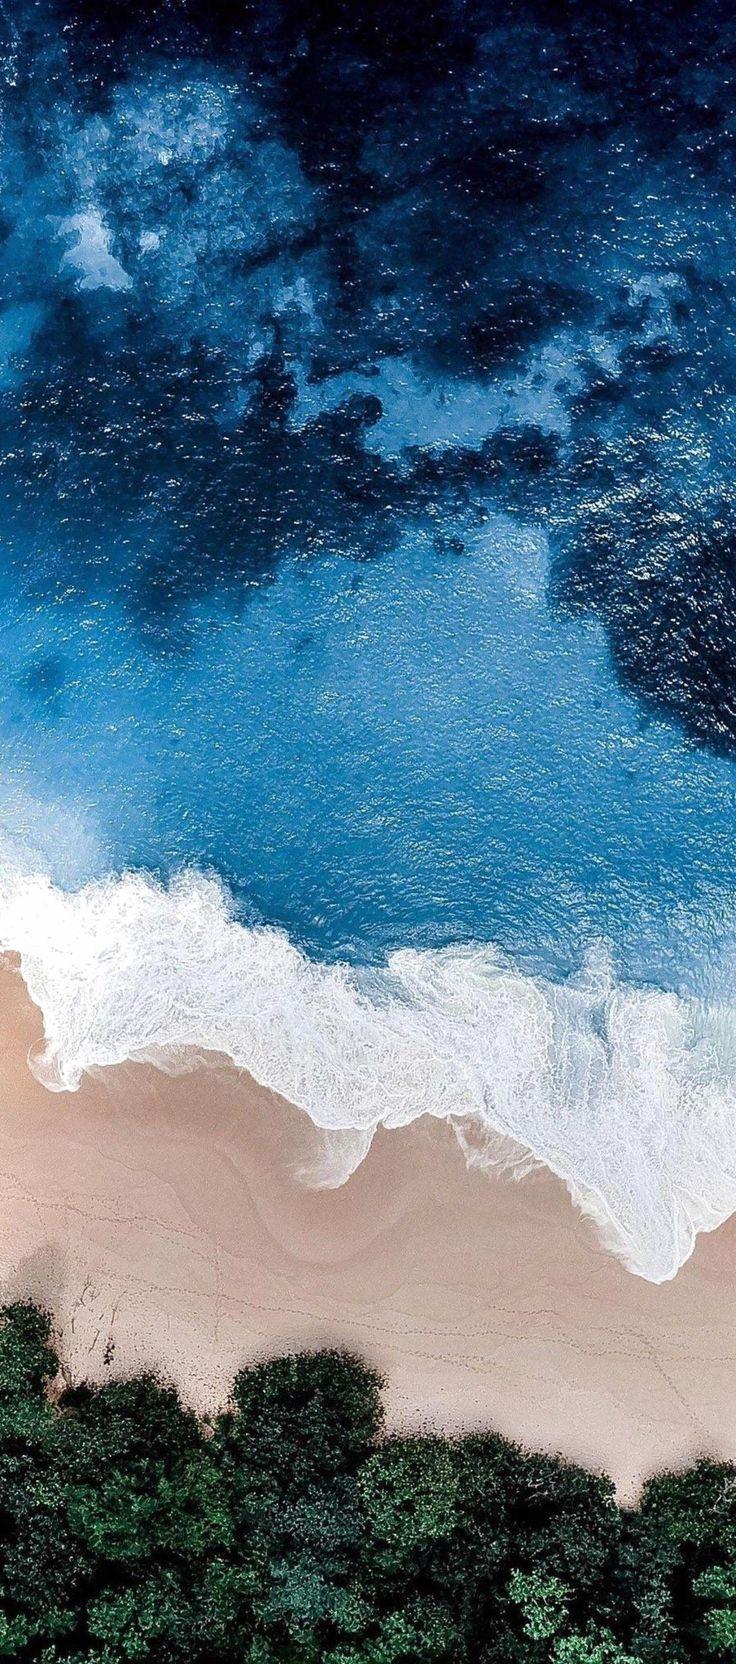 Iphonexs Iphone خلفيات ايفون Iphone Xr Amp Xs Wallpaper Hd Tecnologis خلفيات ايفون Wallpaper Iphone Summer Cute Summer Wallpapers Summer Wallpaper Ideas for ocean wallpaper for iphone xr